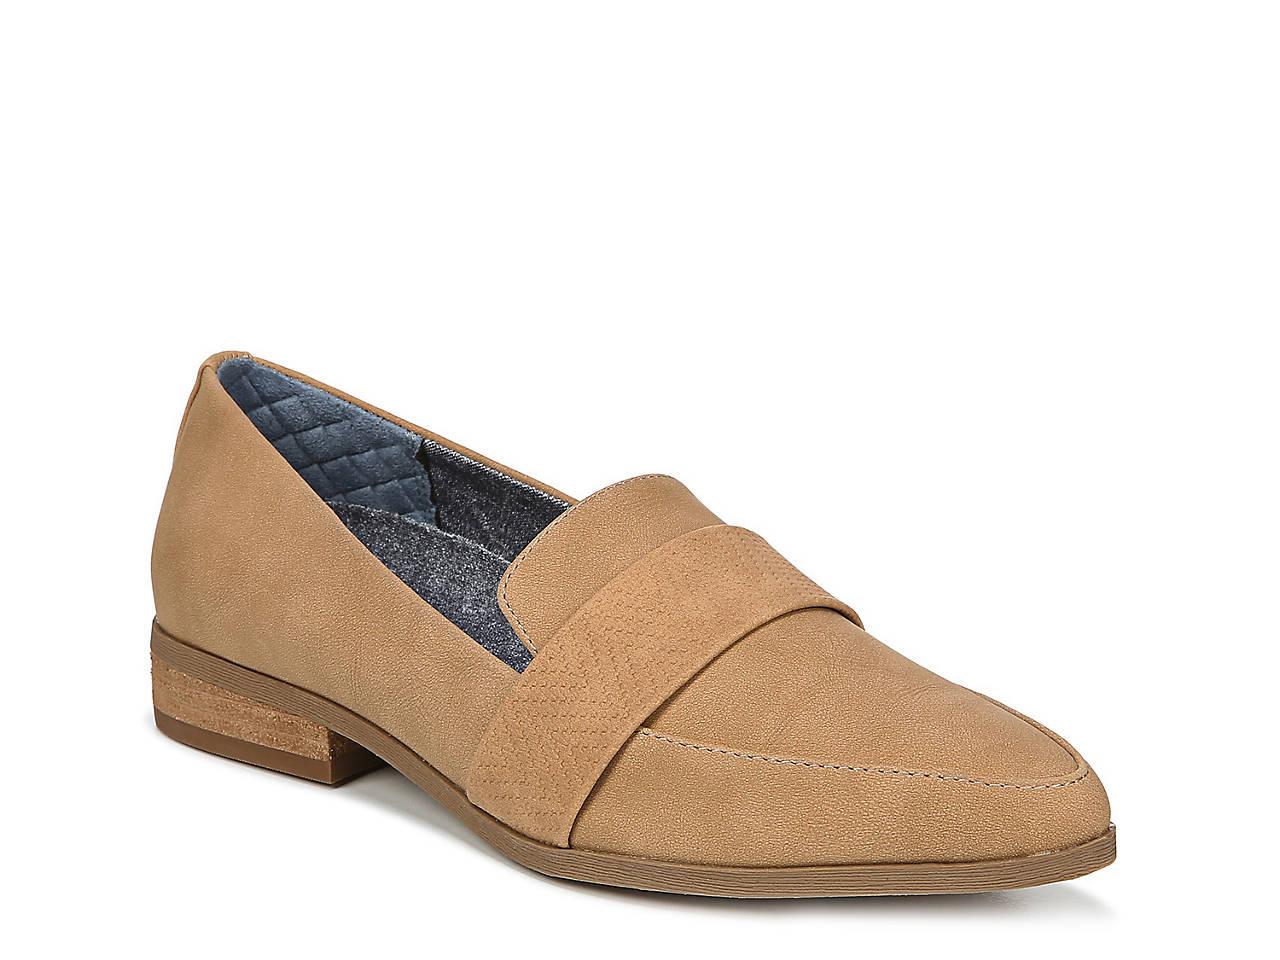 b0f453b03c Dr. Scholl's Esta Loafer Women's Shoes | DSW